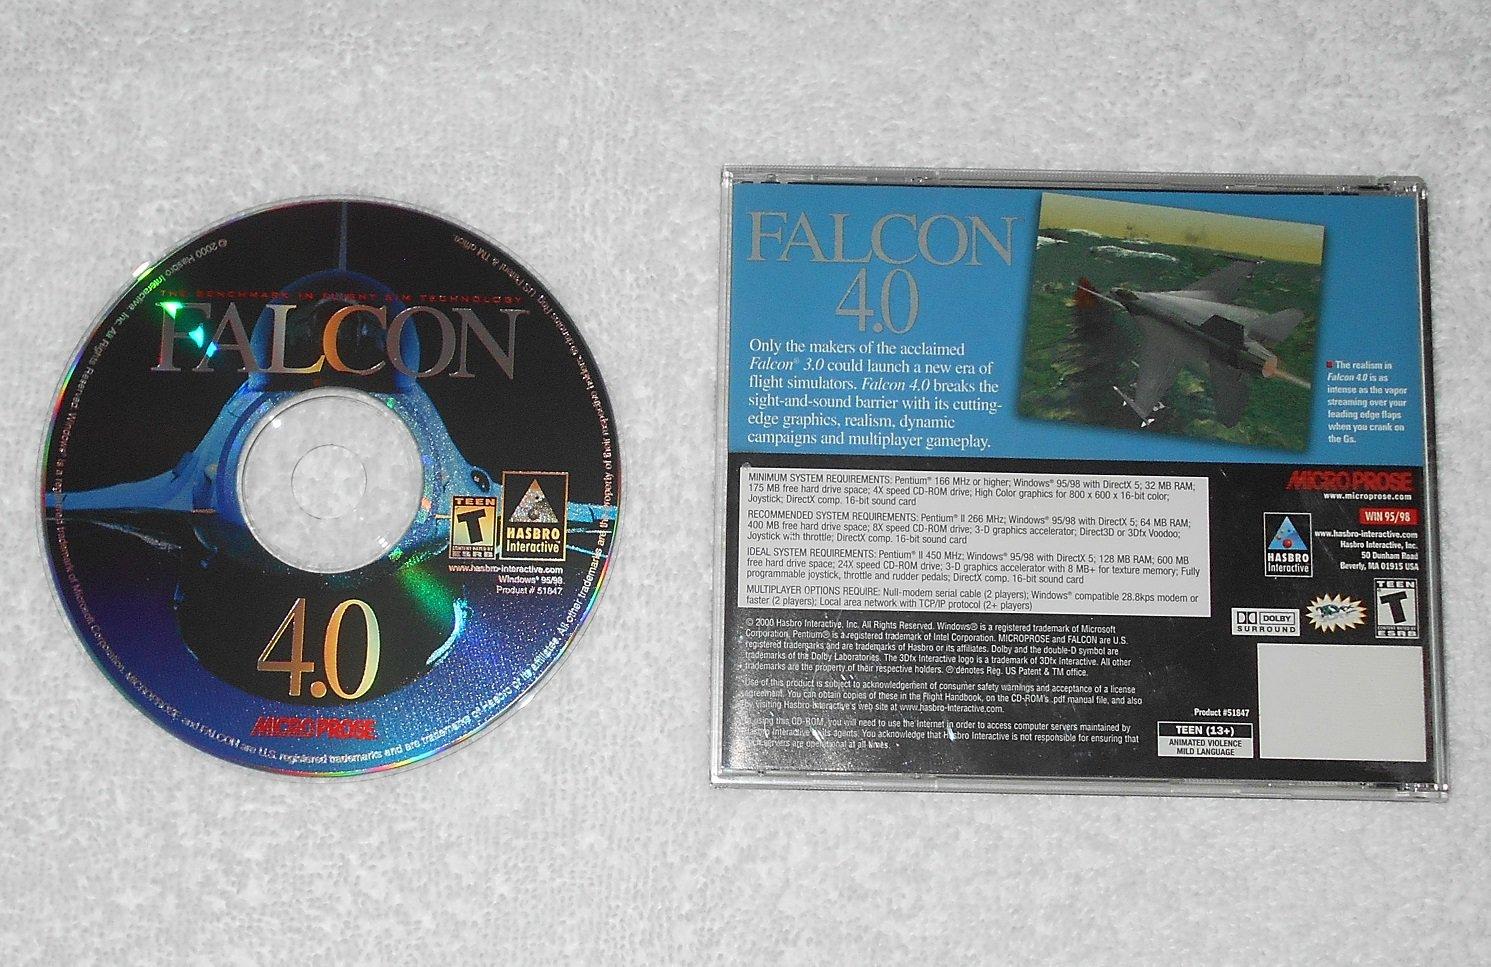 Falcon 4.0 - Flight Simulator PC Game - Hasbro Microprose - 2000 - CD-ROM & Case Only - English